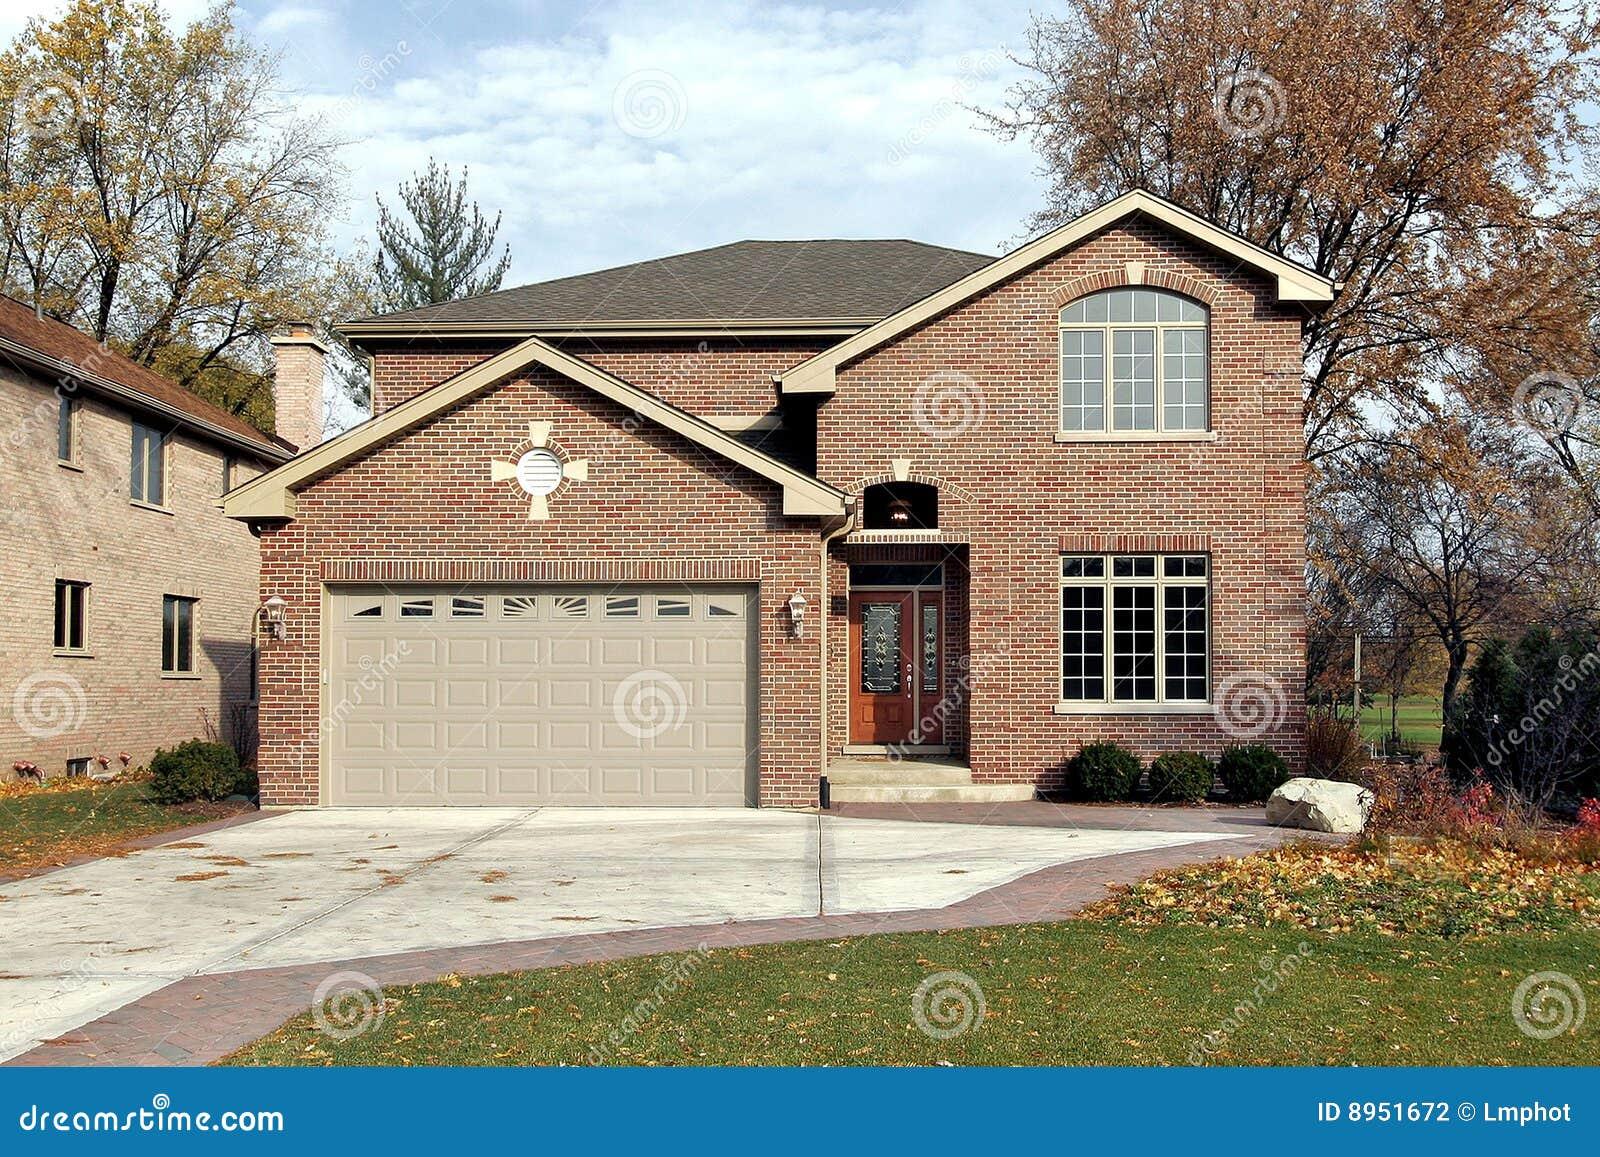 Brick home in fall